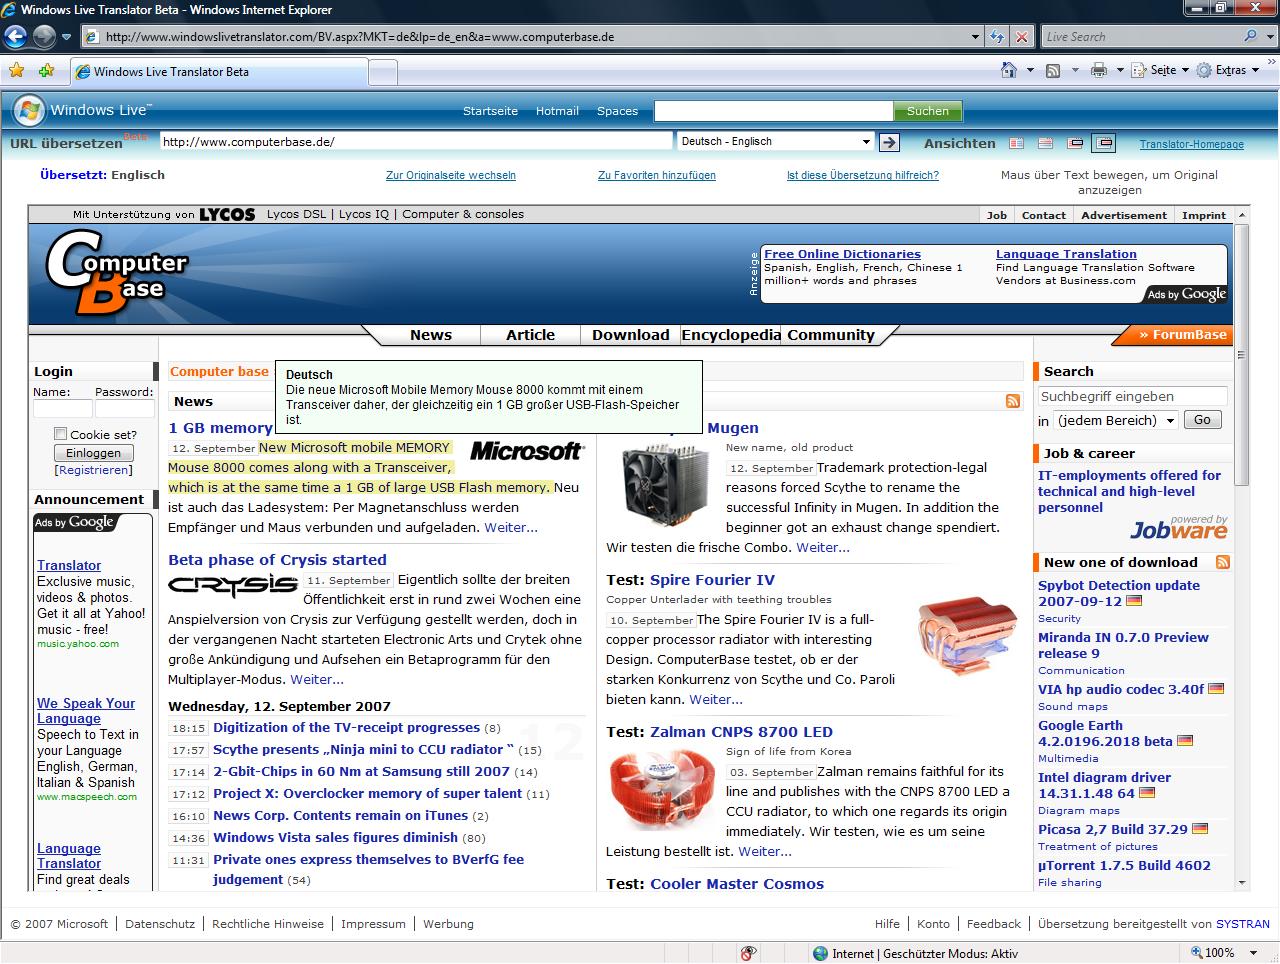 Windows Live Translator mit Hover Original